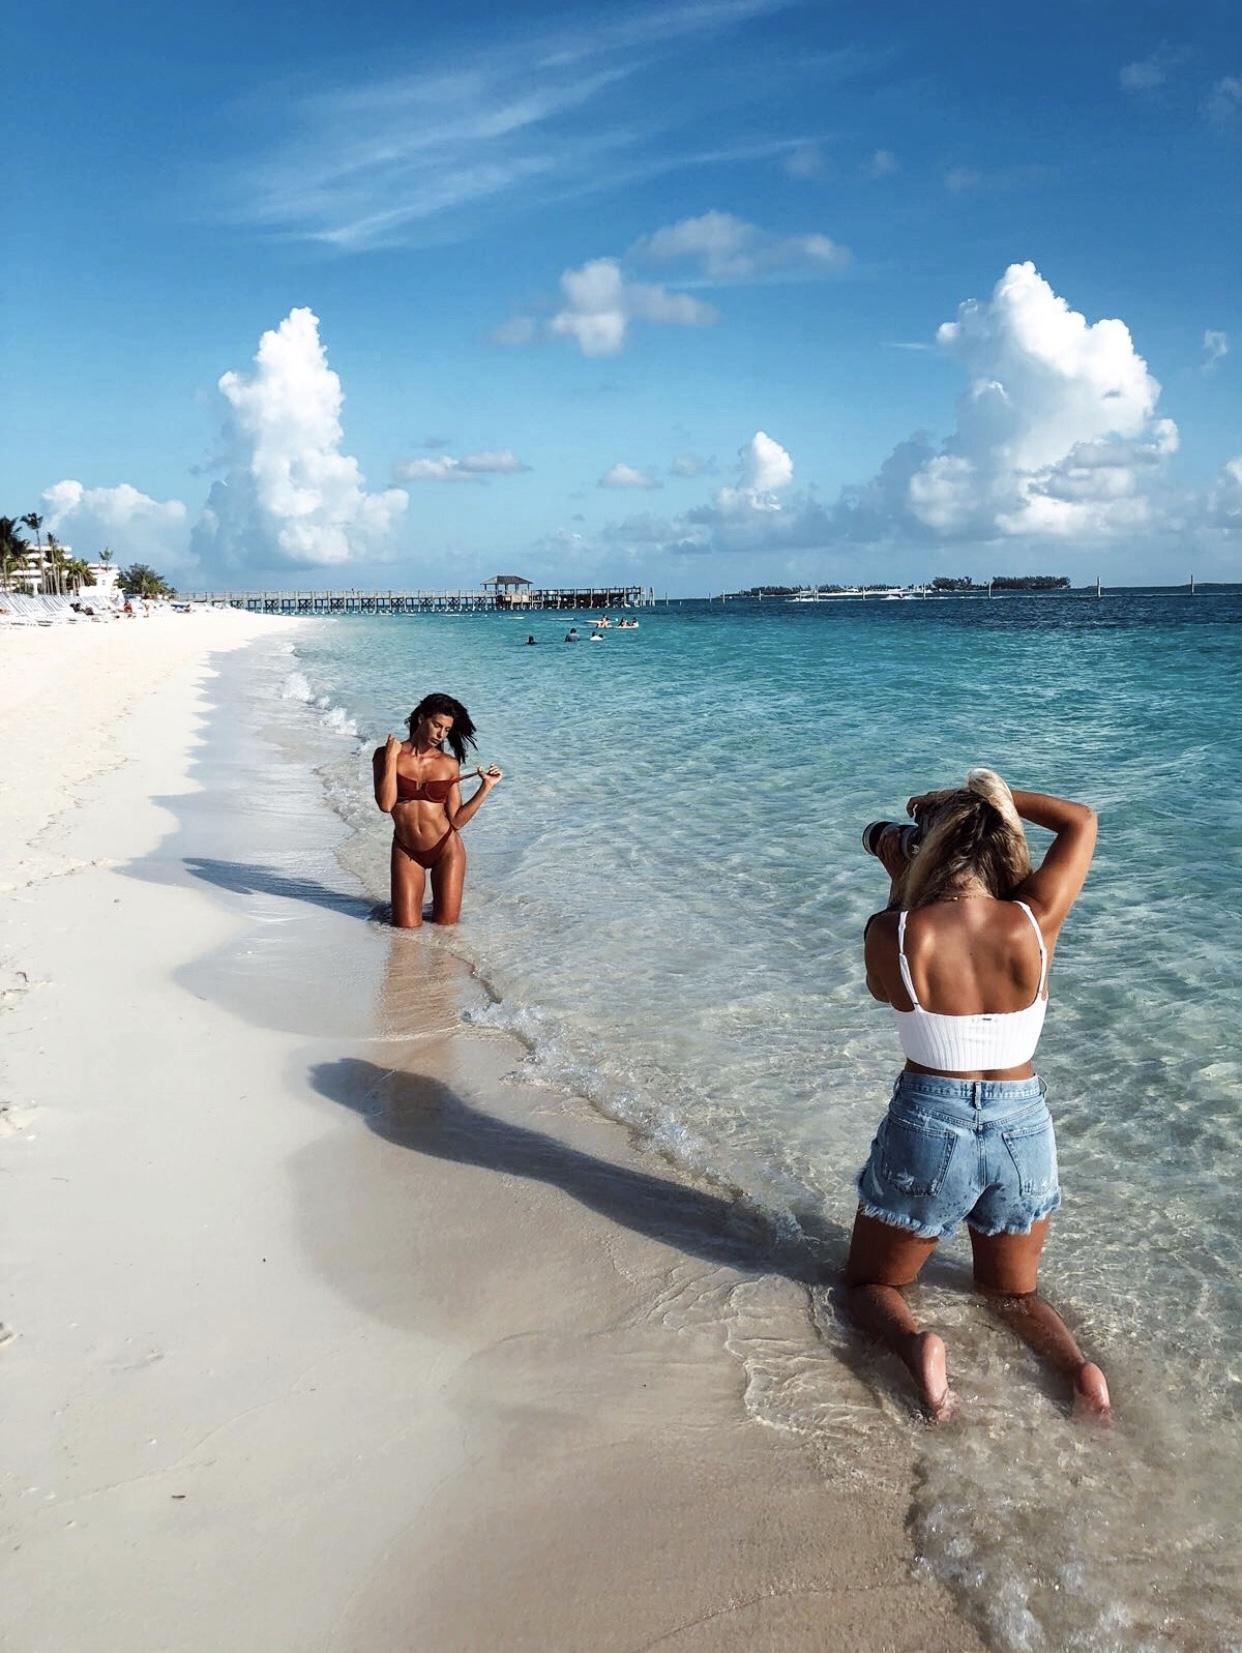 Veronica Sams Beach Photography